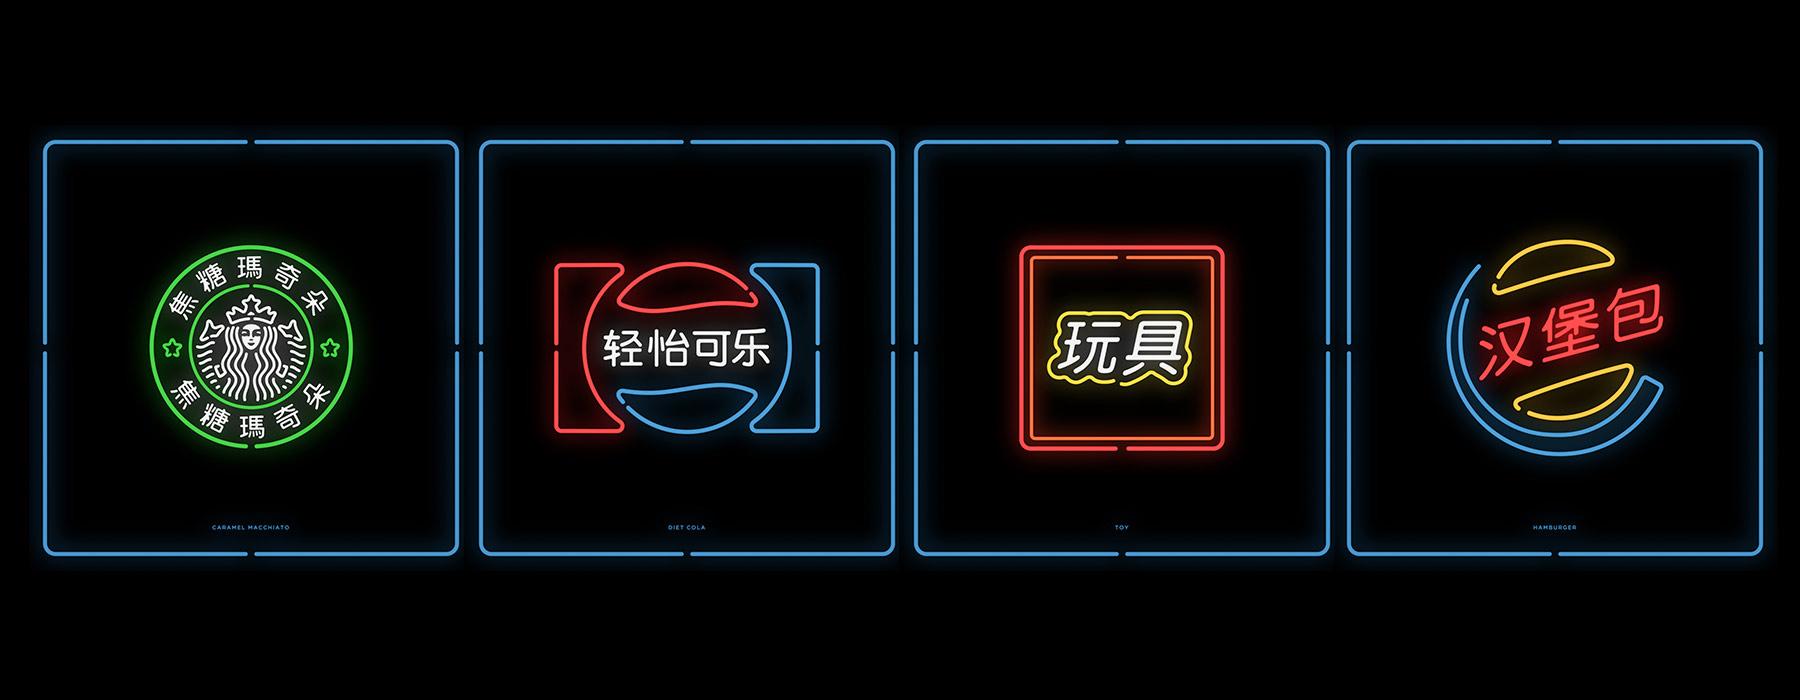 Chinatown_enseigne_home